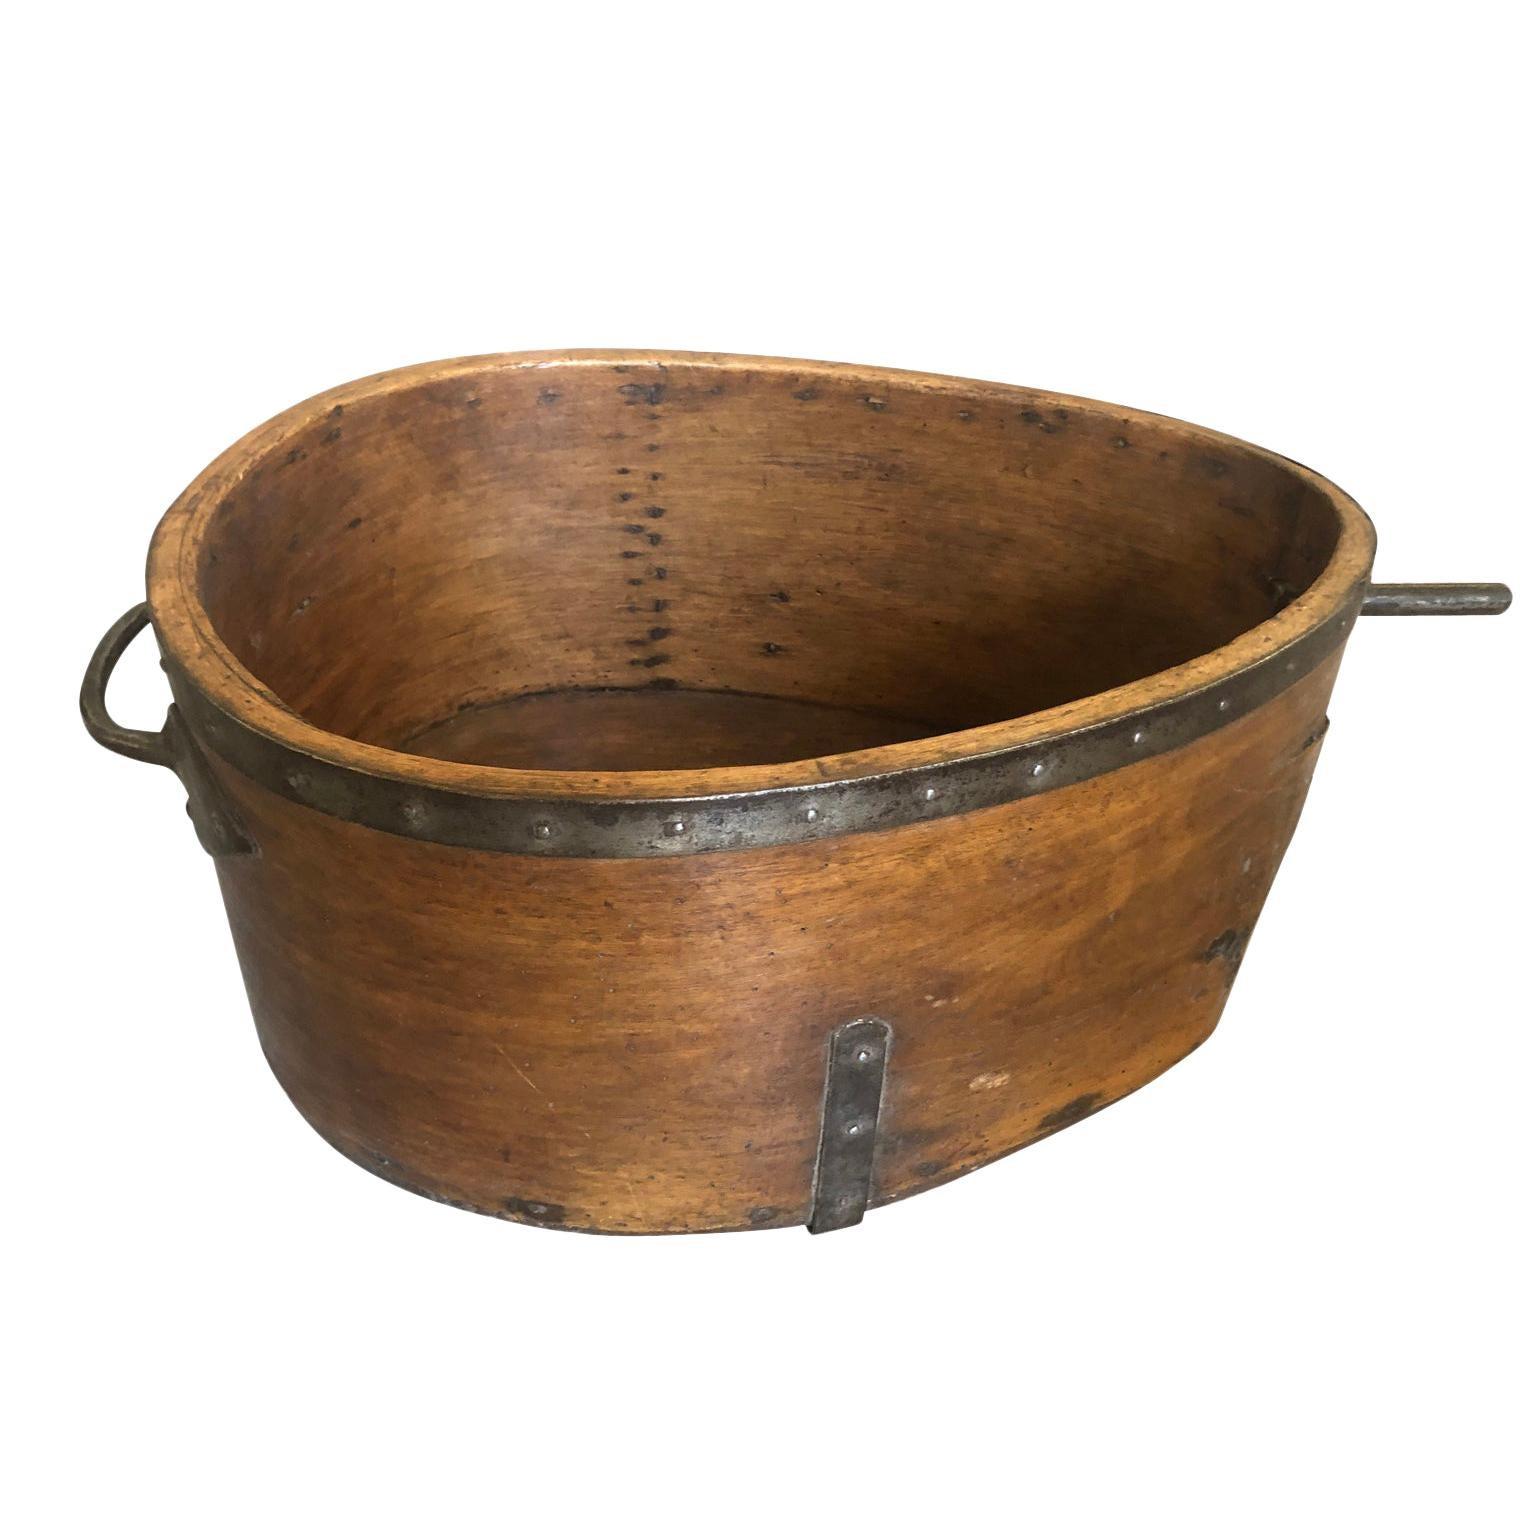 French 19th Century Grain Measure